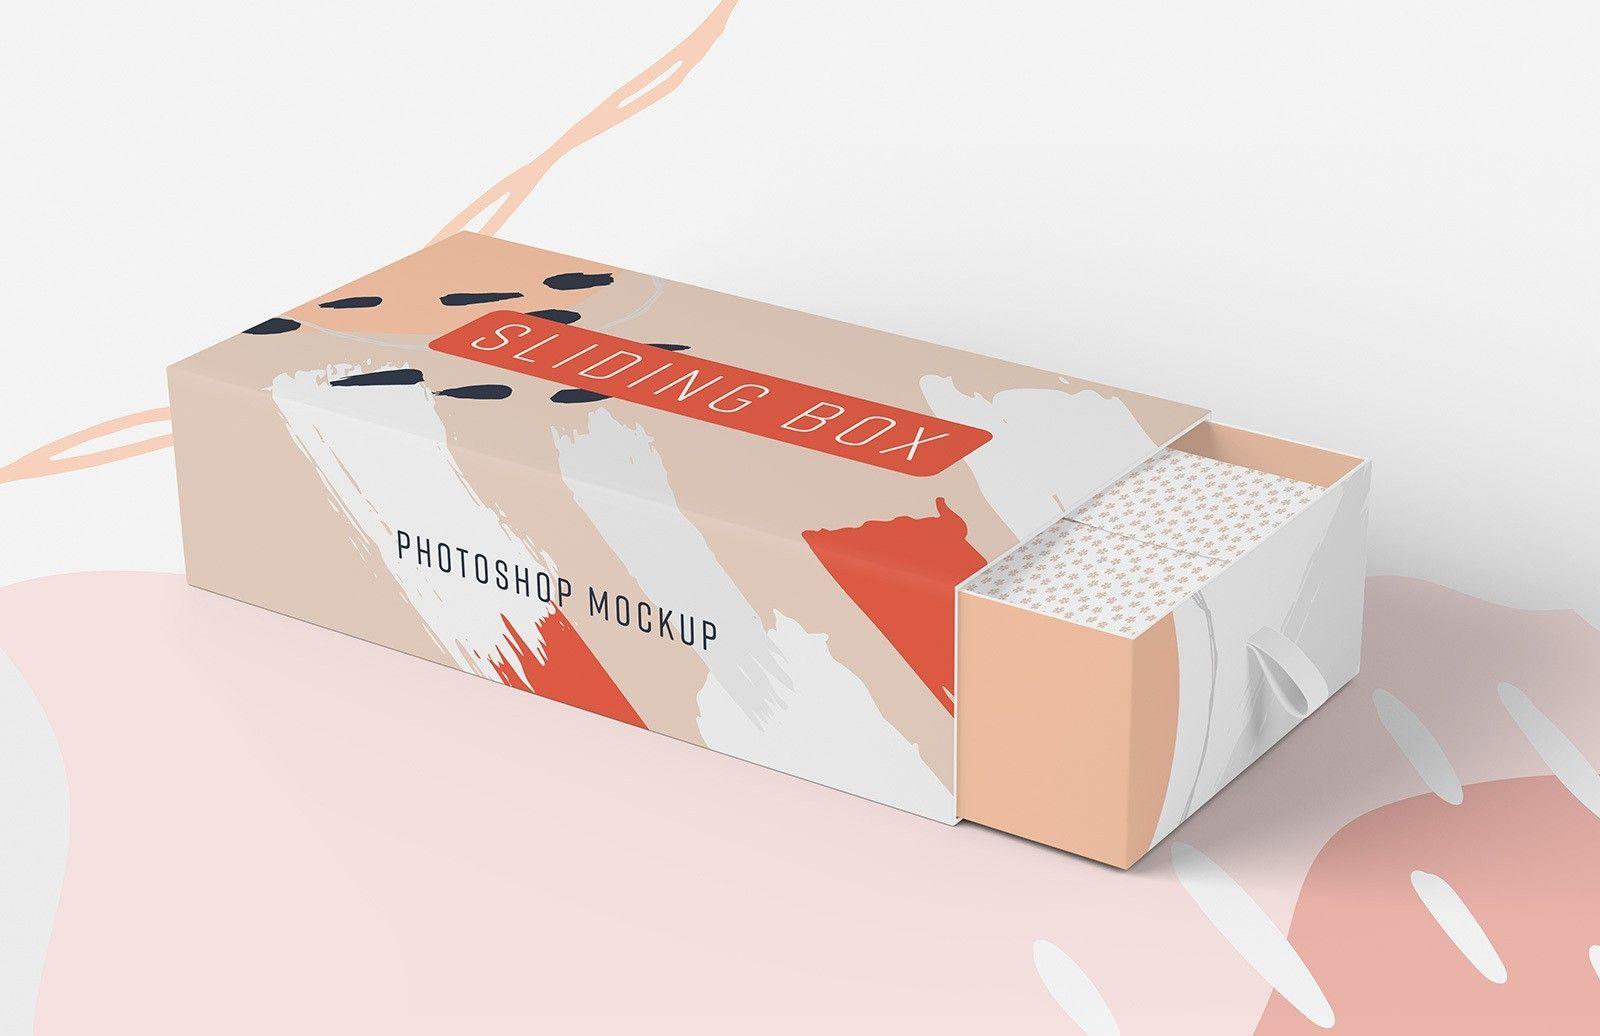 Download Sliding Box Packaging Mockup Packaging Mockup Box Mockup Free Packaging Mockup